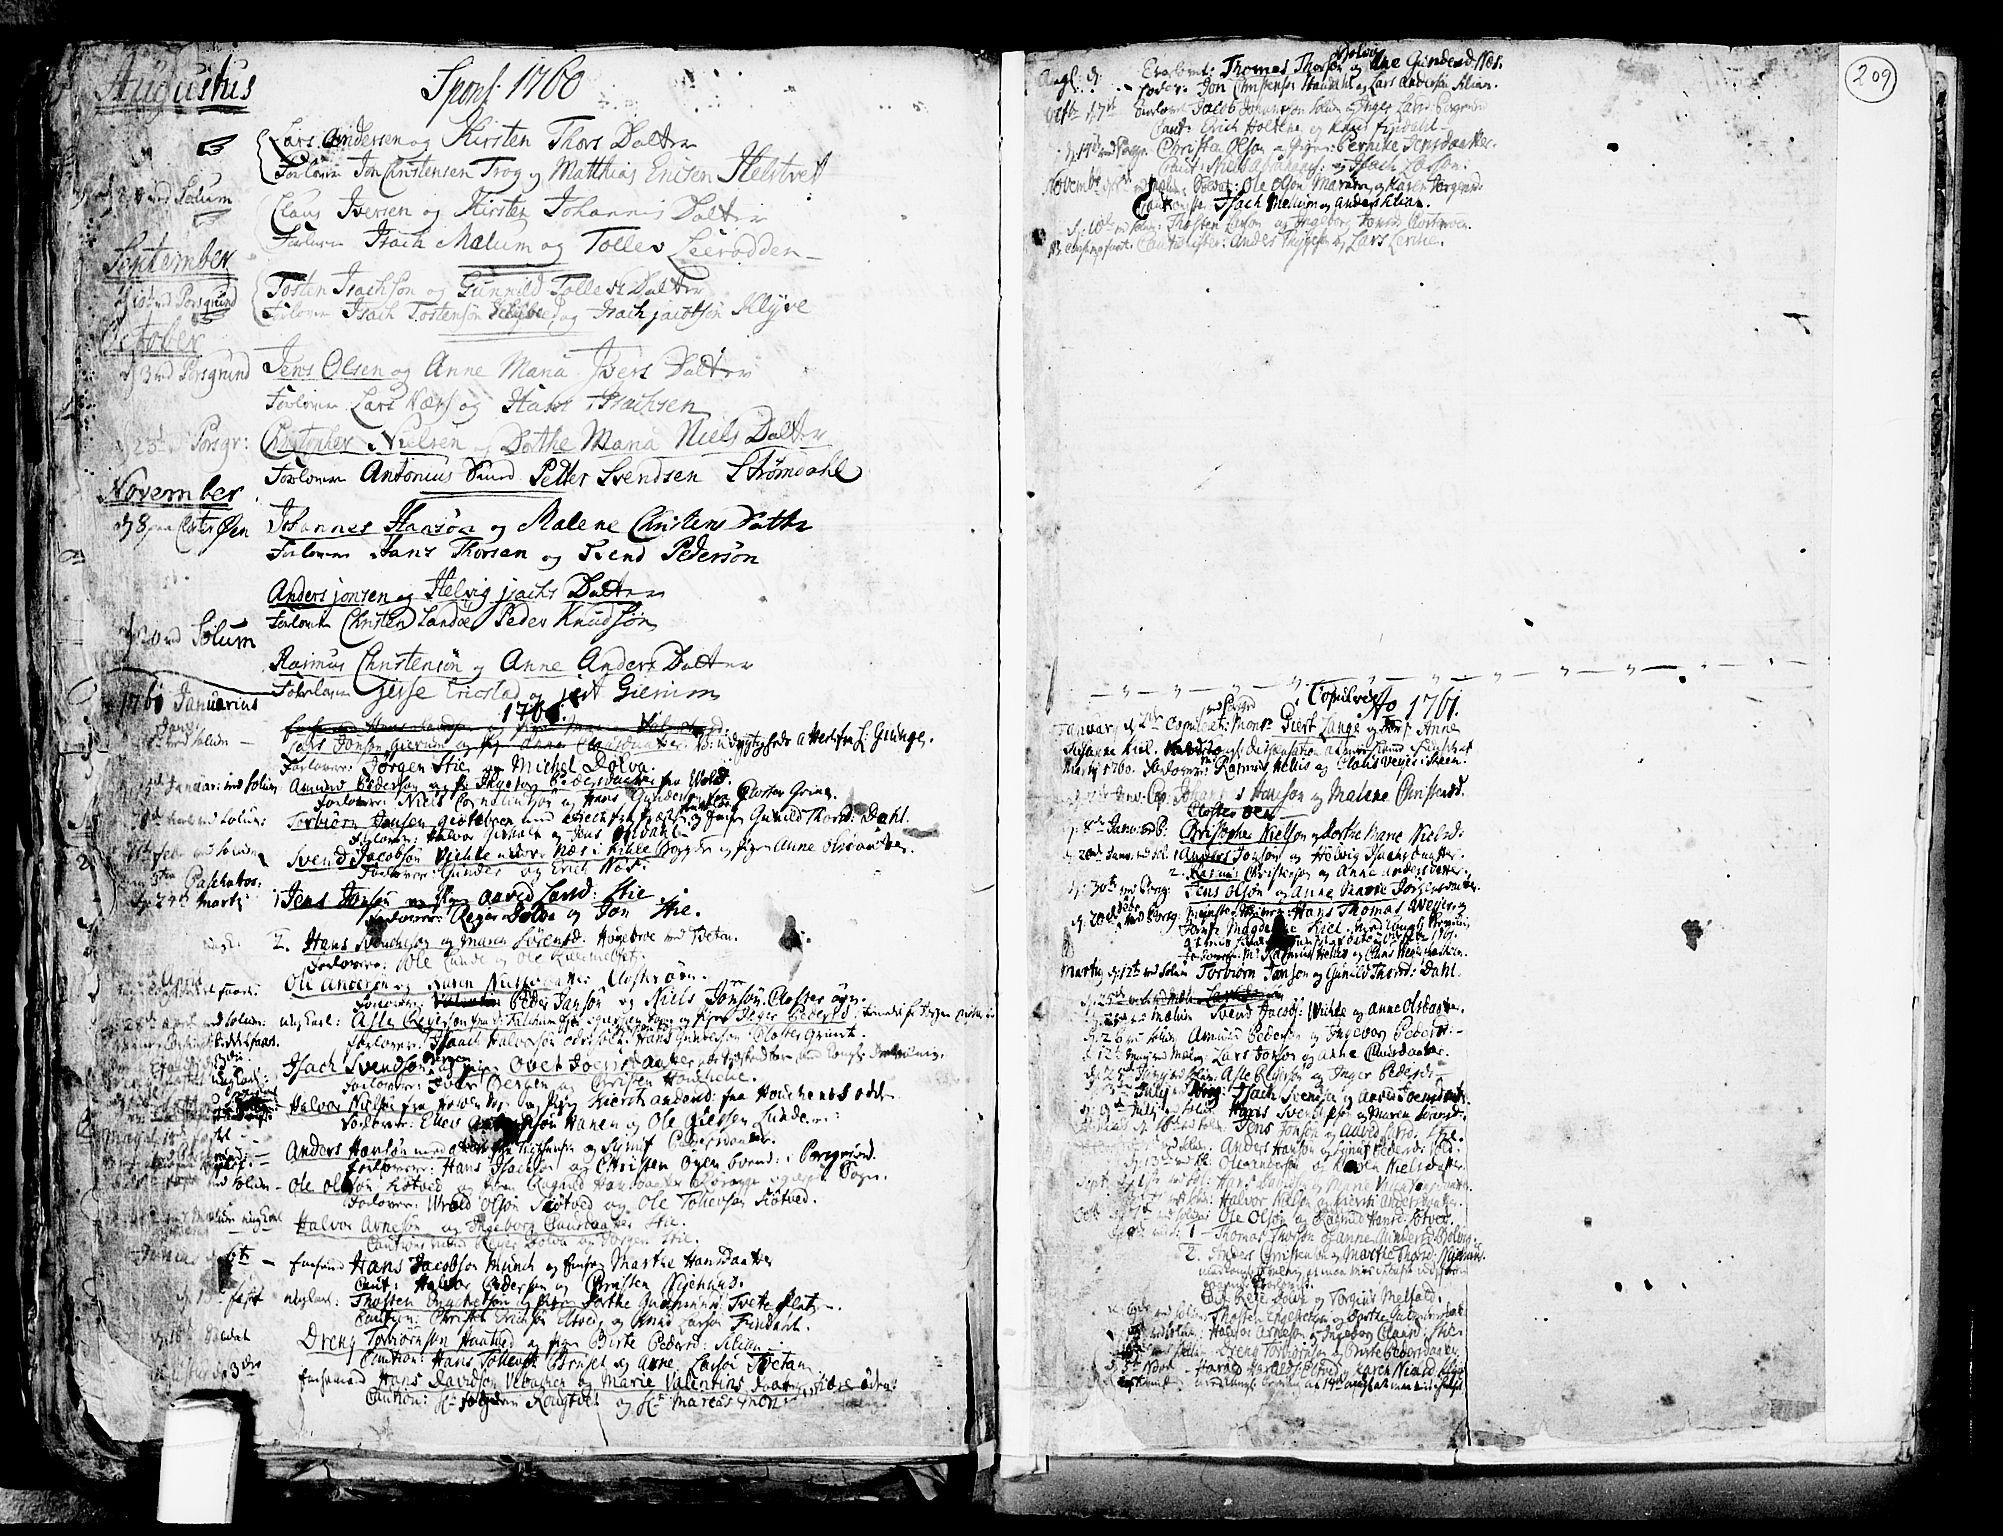 SAKO, Solum kirkebøker, F/Fa/L0002: Ministerialbok nr. I 2, 1713-1761, s. 209